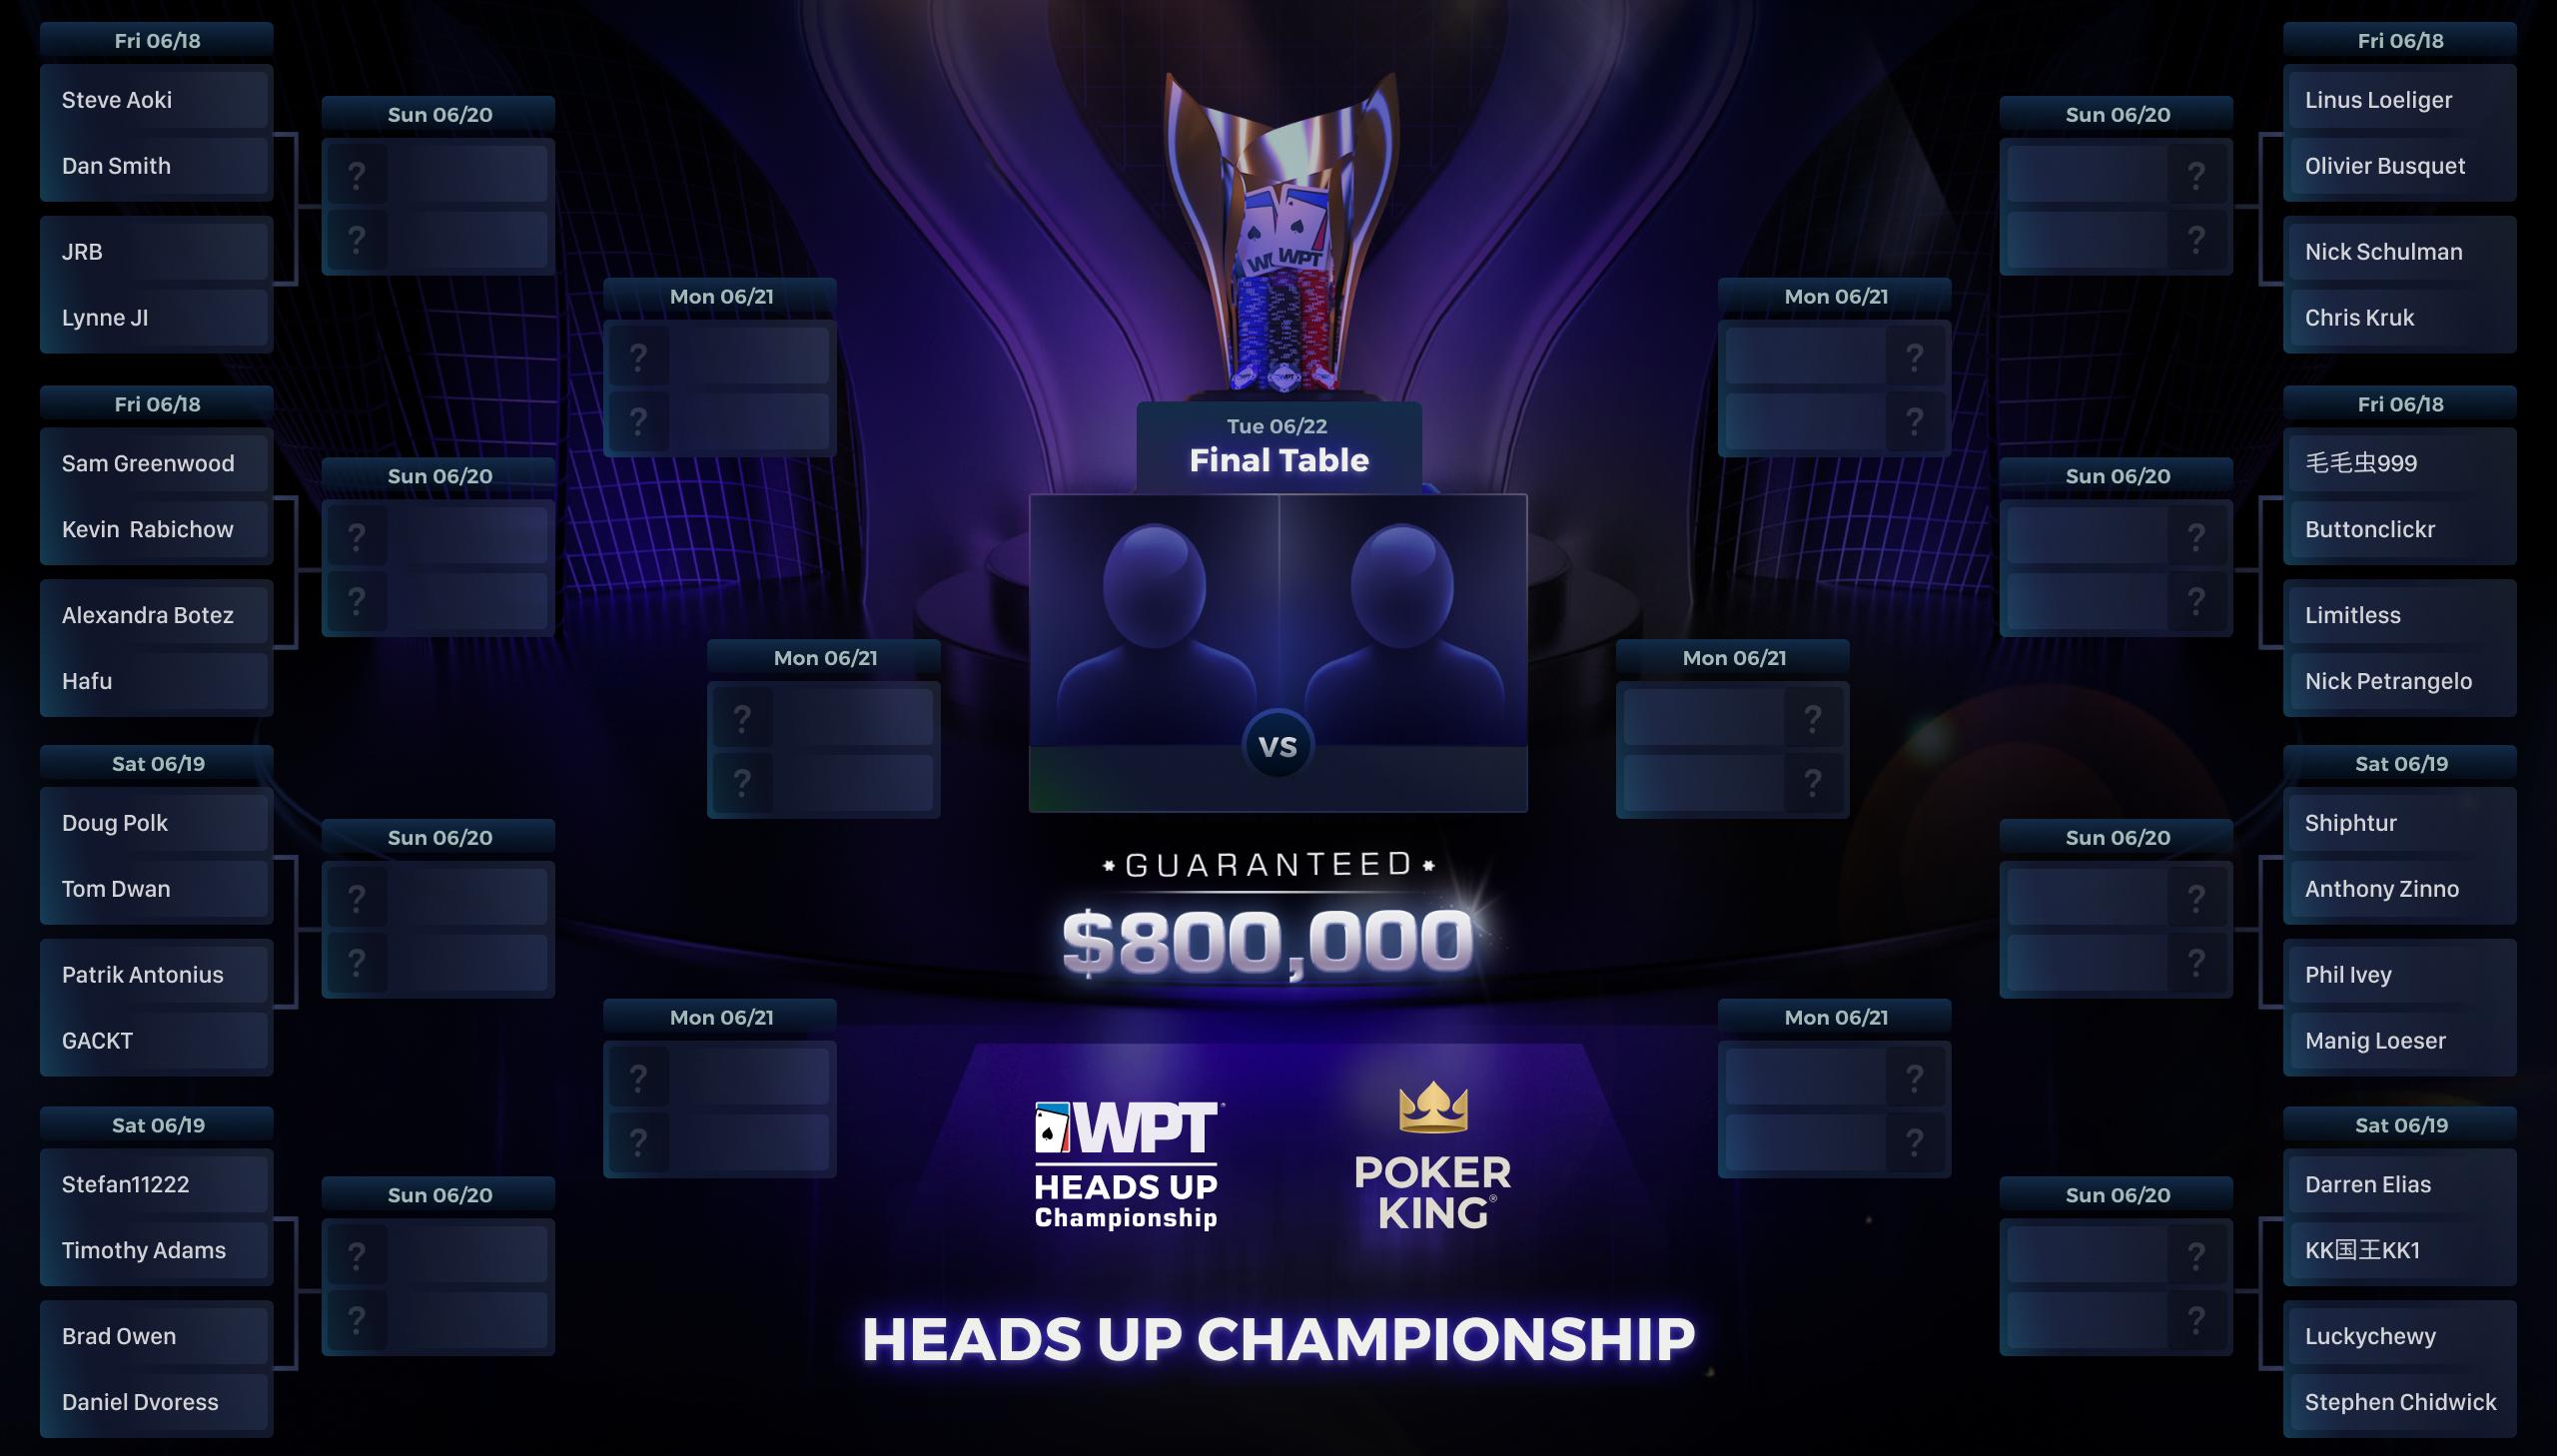 Ronda #1 do $25000 WPT HU Championship